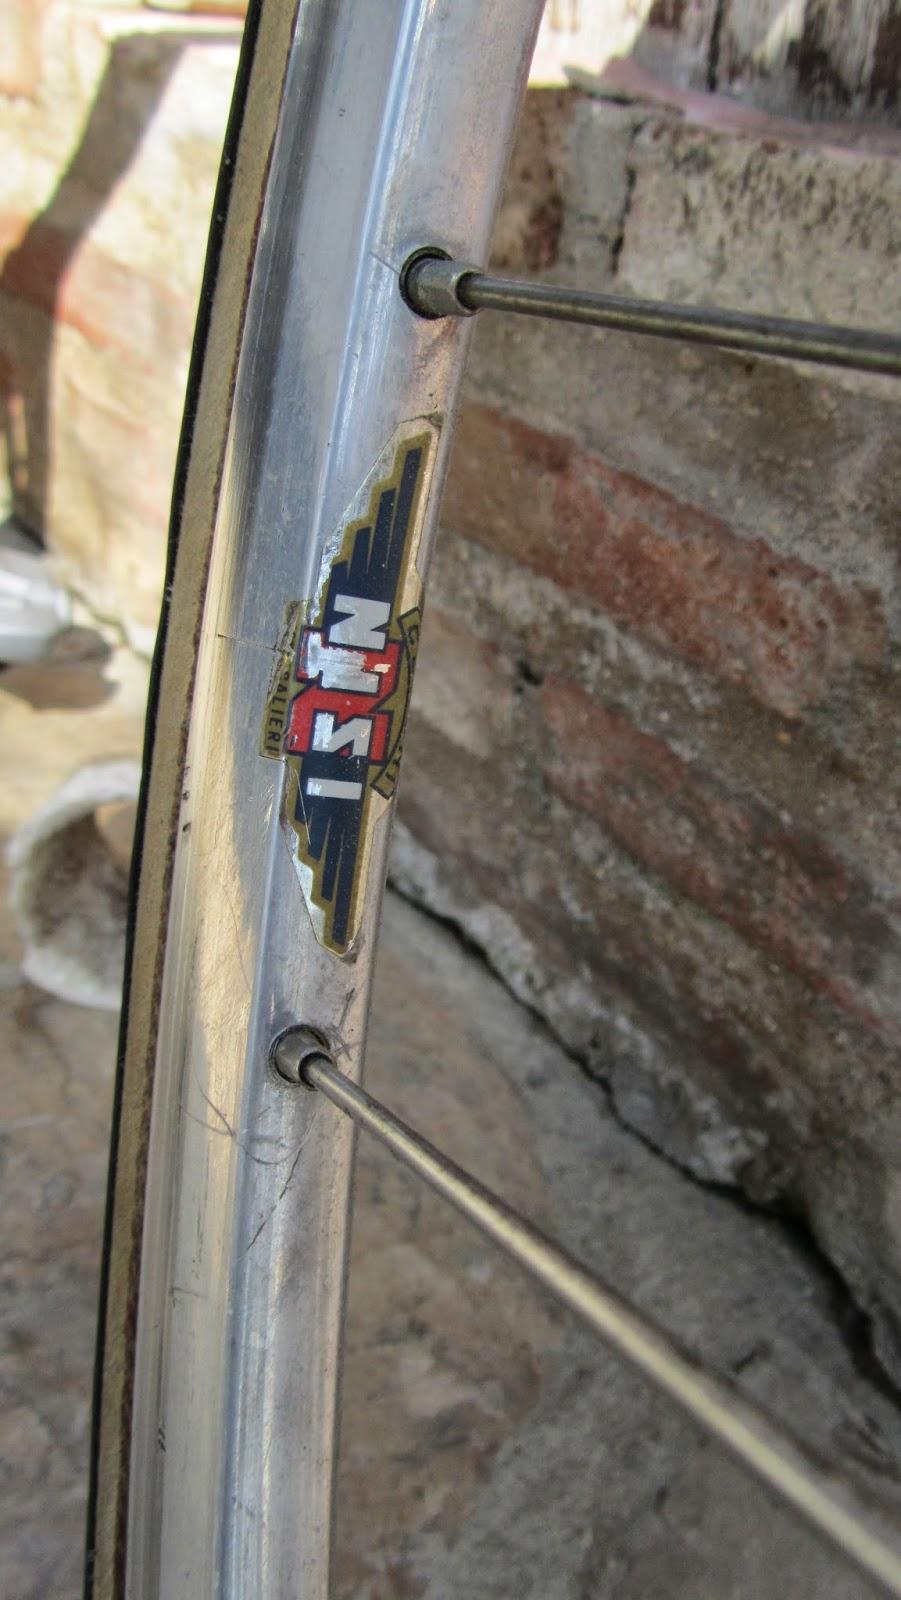 bicicleta orbea contrarreloj - llanta nisi